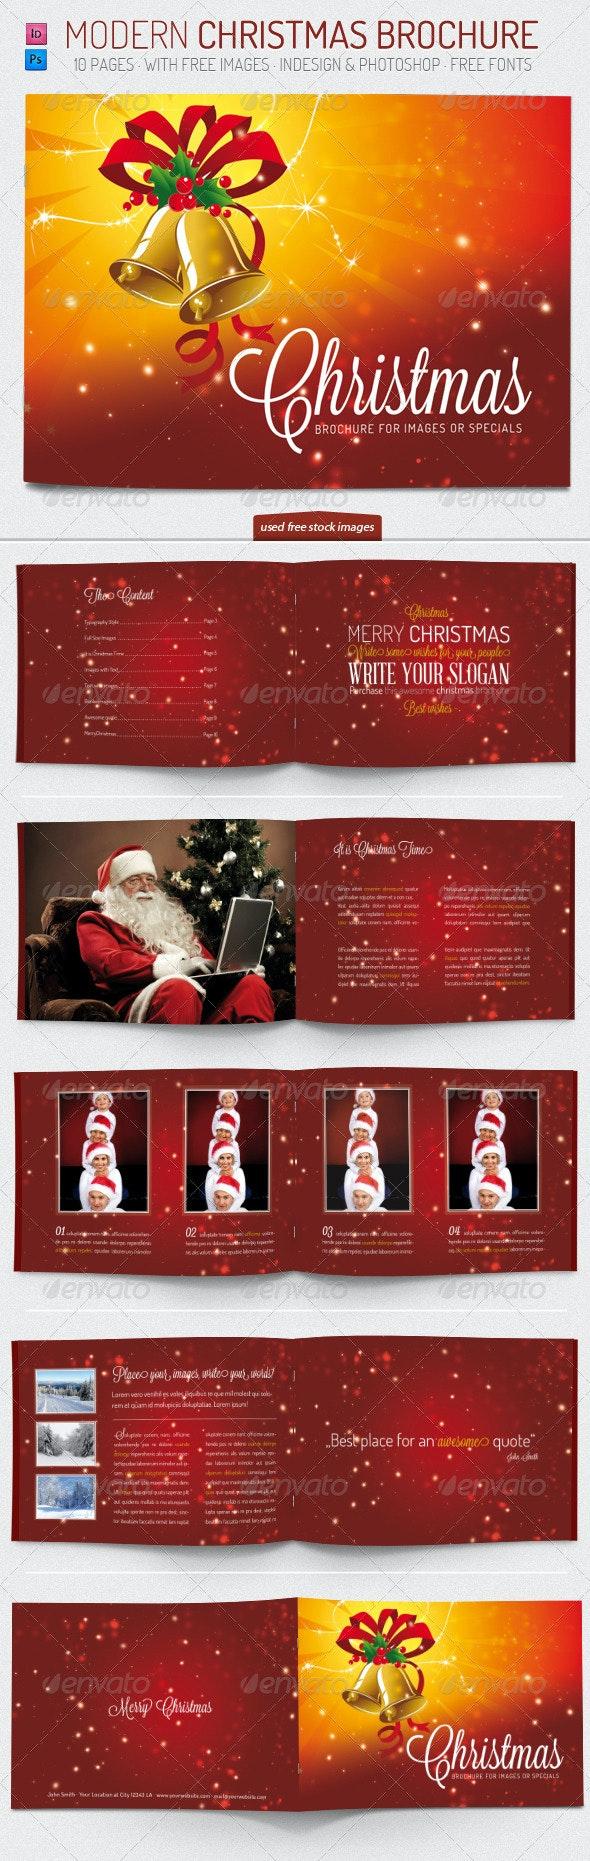 Christmas - Brochure Template - Brochures Print Templates